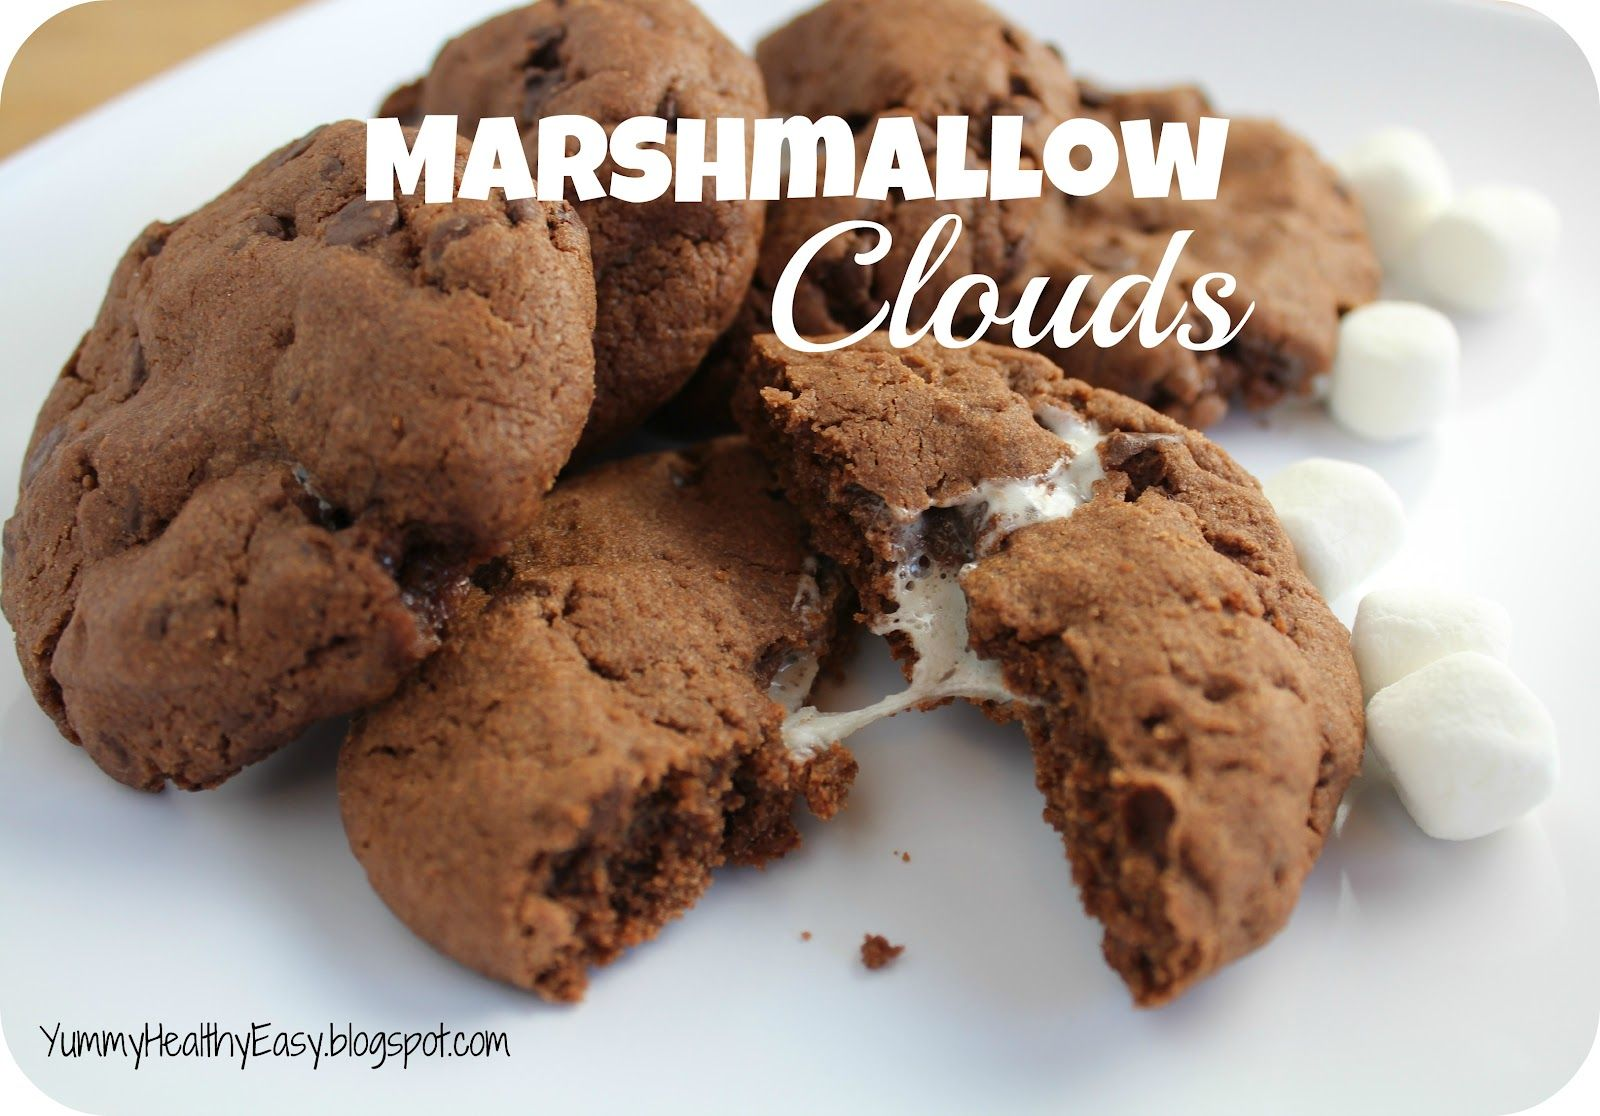 Yummy - Healthy - Easy: Marshmallow Cloud Cookies